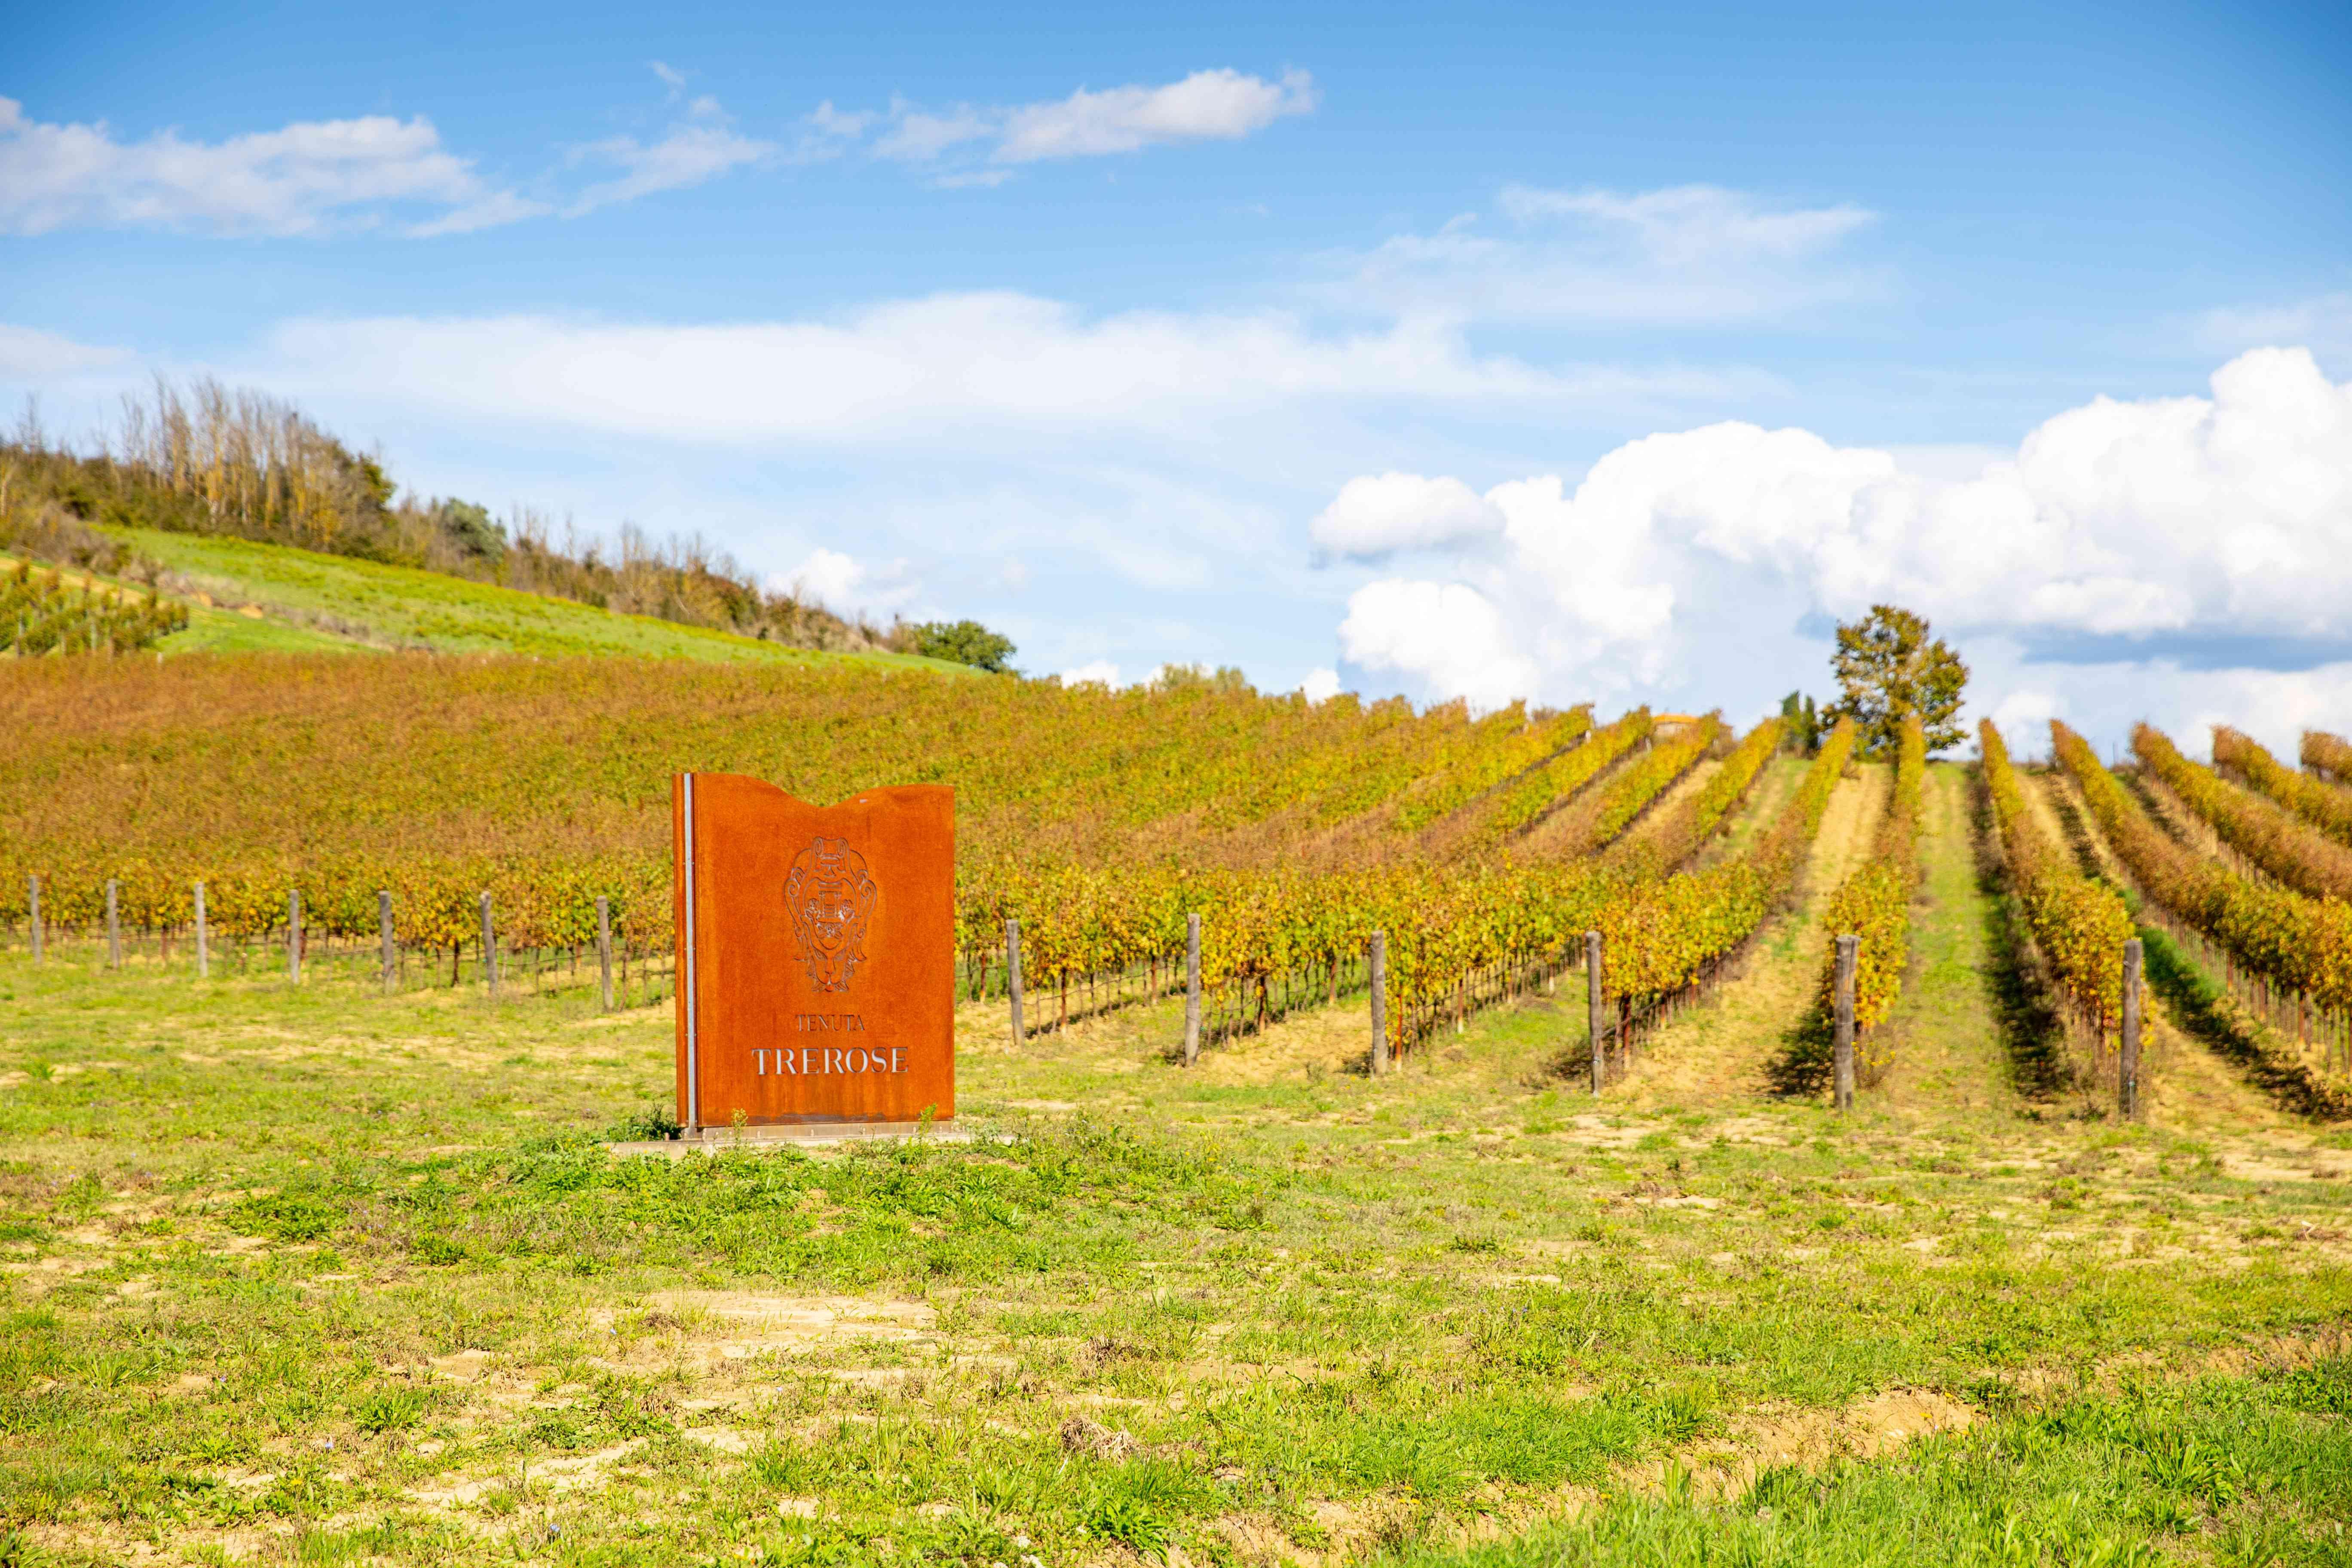 A vineyard in the Chianti region of Tuscany